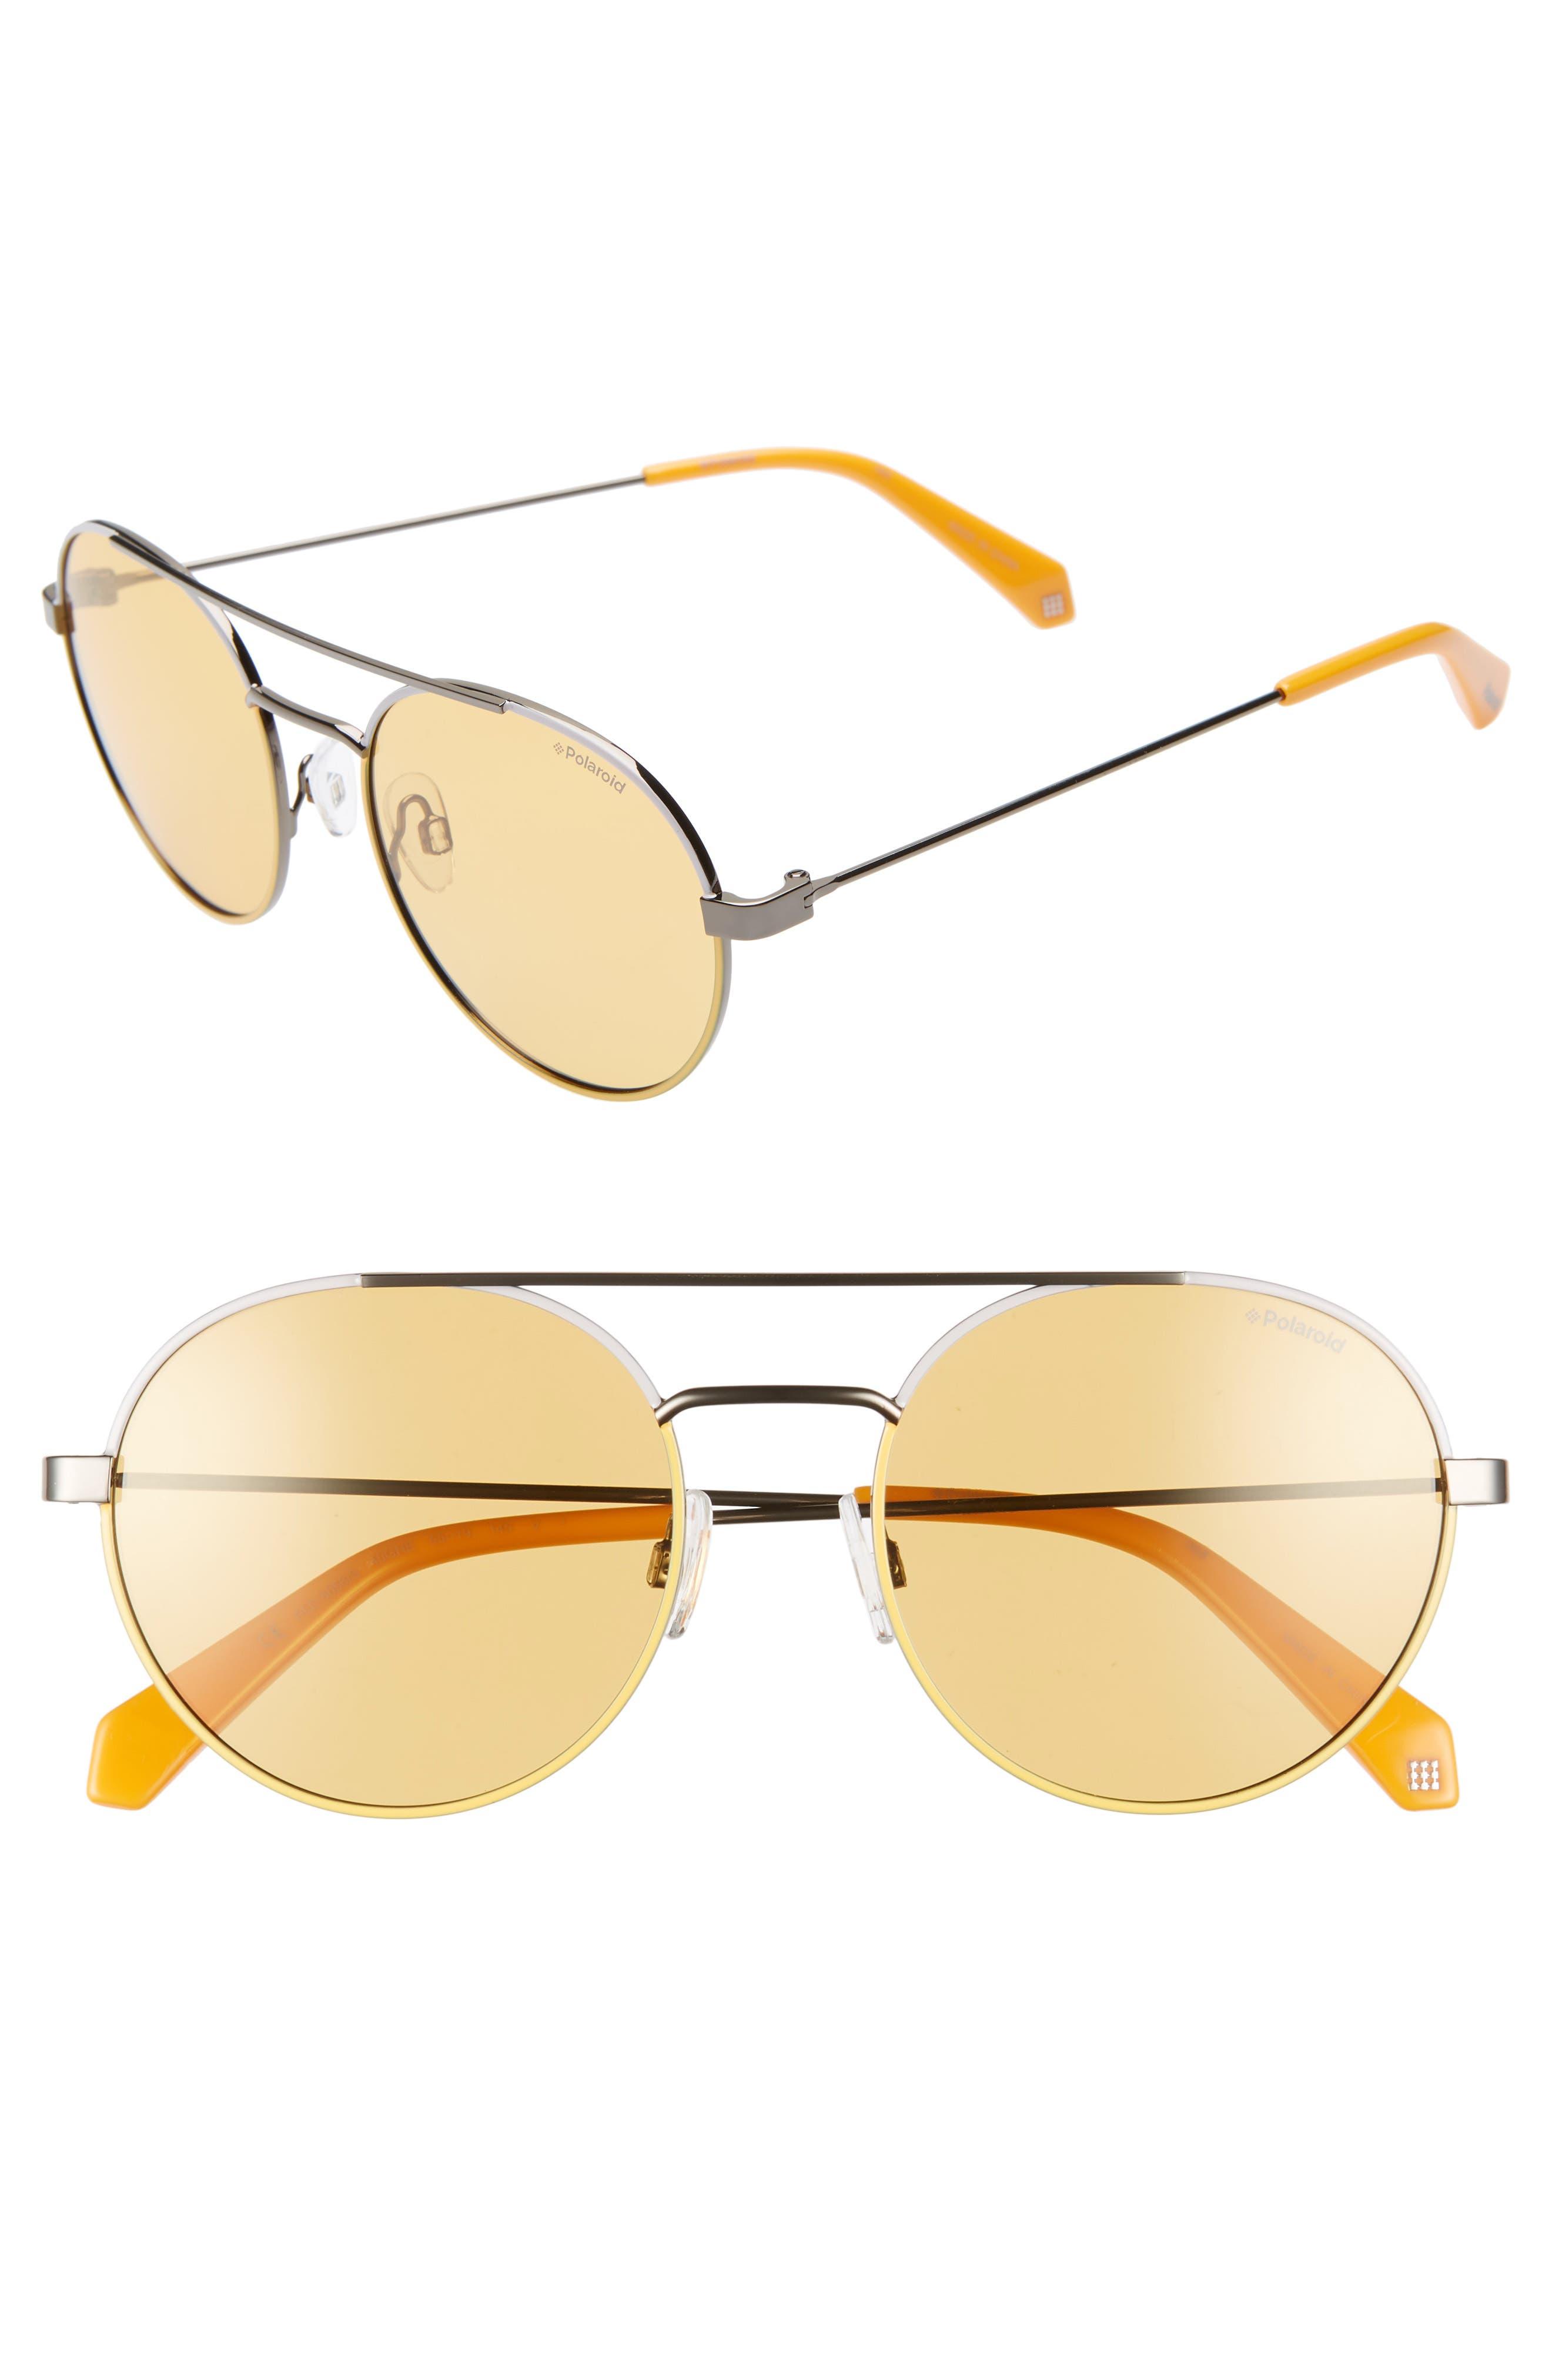 Polaroid 55Mm Polarized Round Aviator Sunglasses - Yellow/ Silver